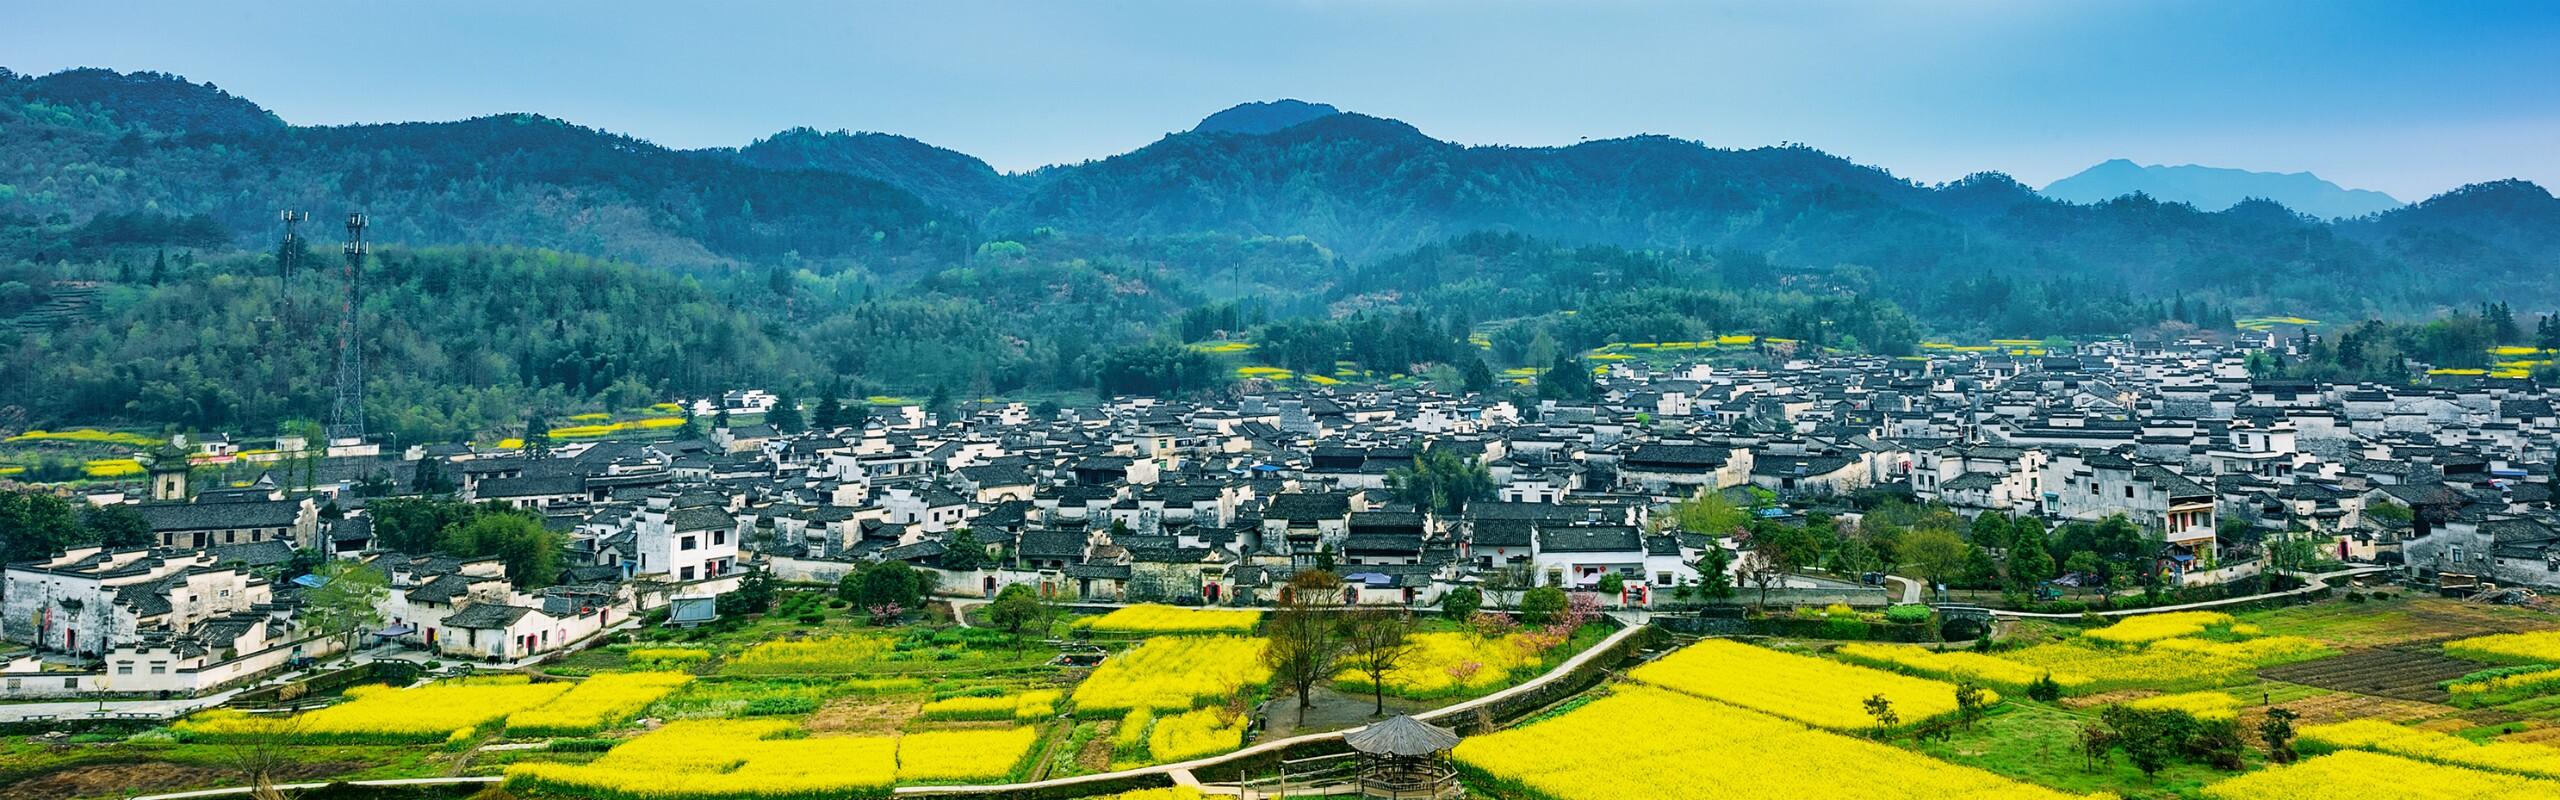 Huangshan Tours - The Yellow Mountains